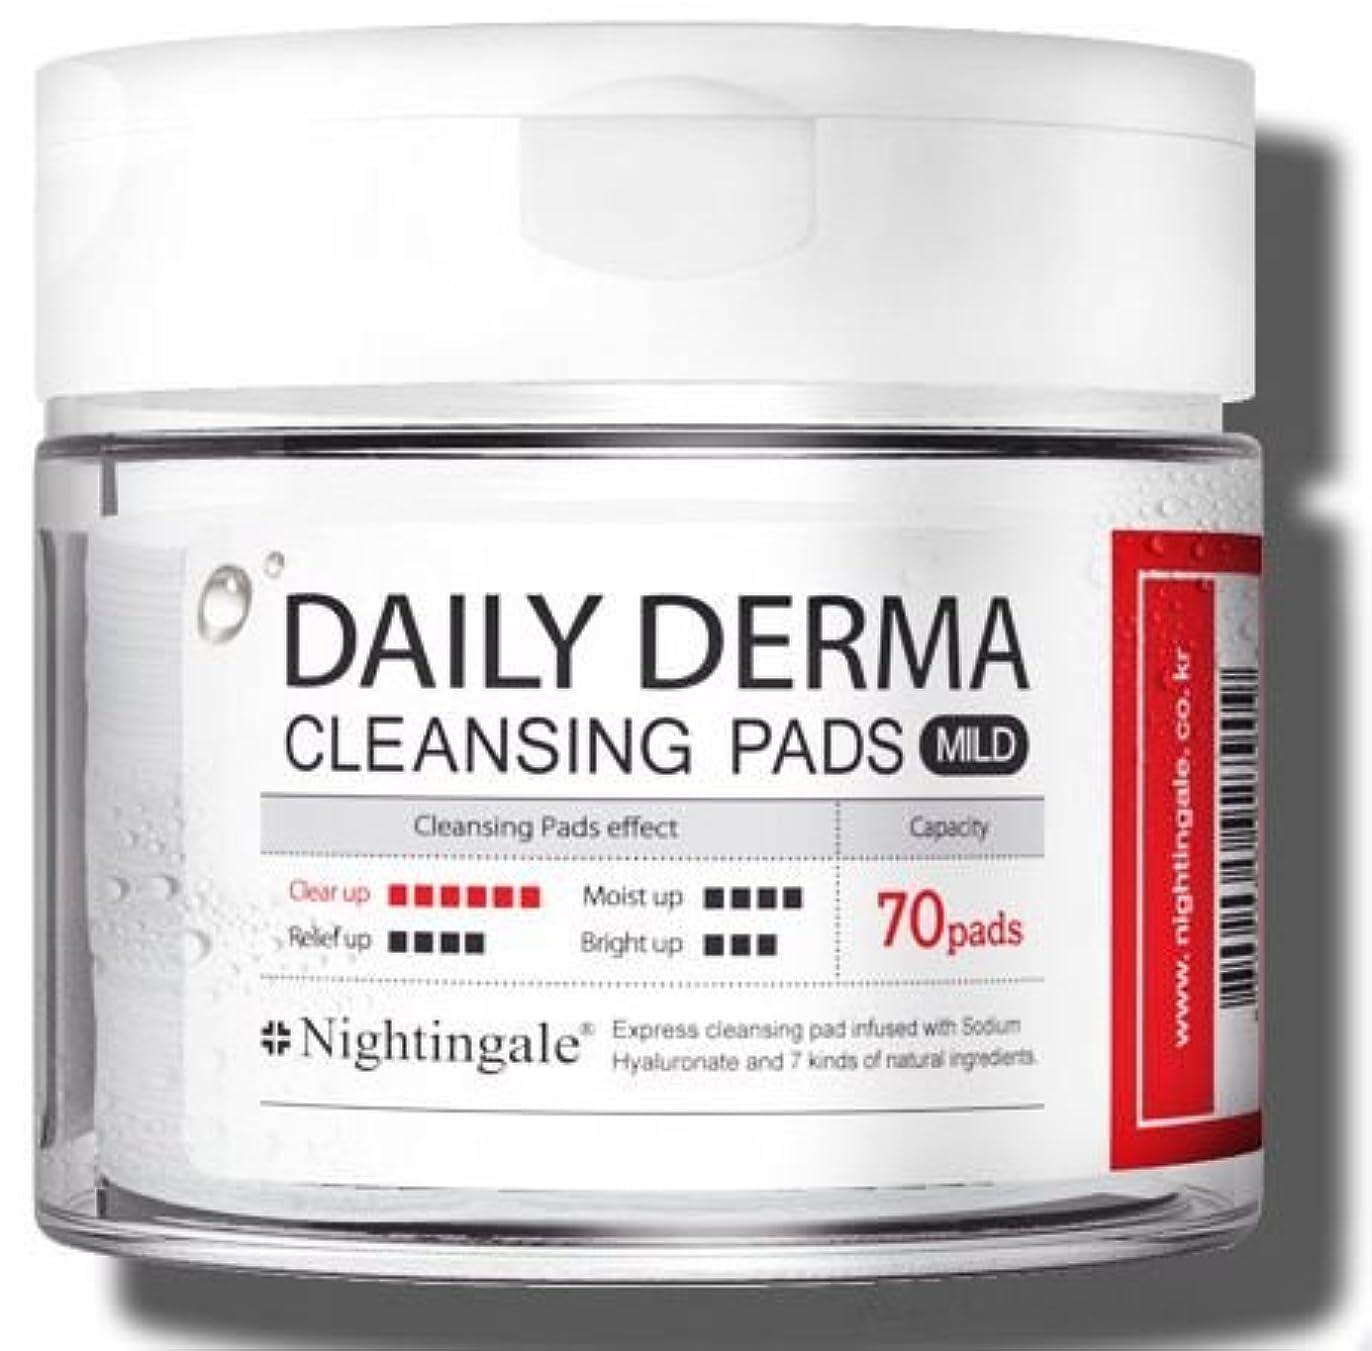 Nightingale Daily Derma Cleansing Pads * Mild * 70pads/ナイチンゲール デイリー ダーマ クレンジング パッド * マイルド * 70枚入り [並行輸入品]